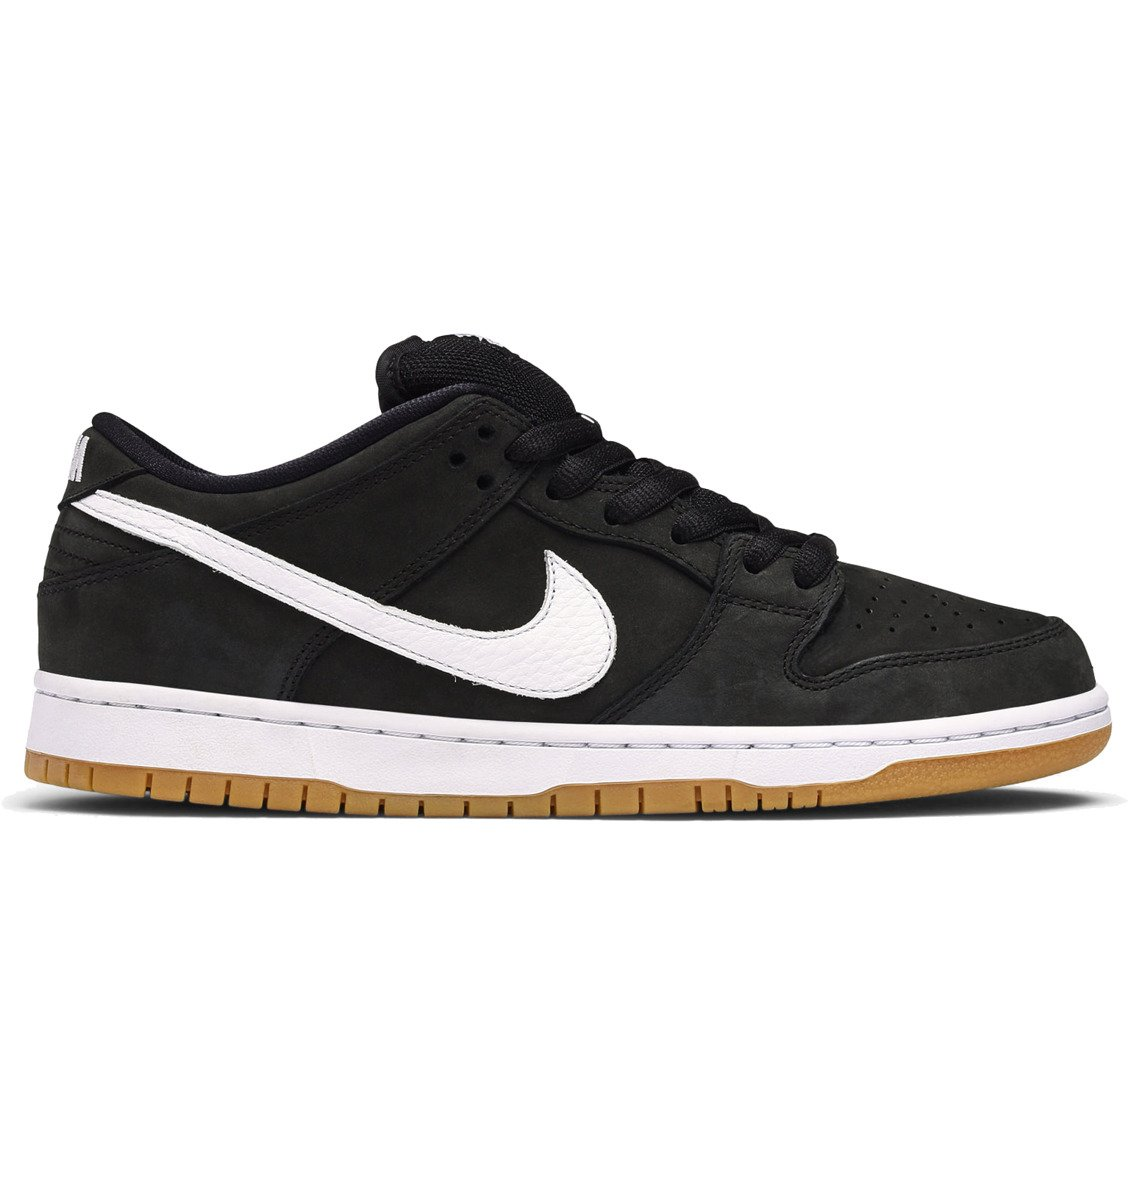 innovative design 9c93c 00230 Buty Nike SB Zoom Dunk Low Pro QS • Miniramp Skateshop